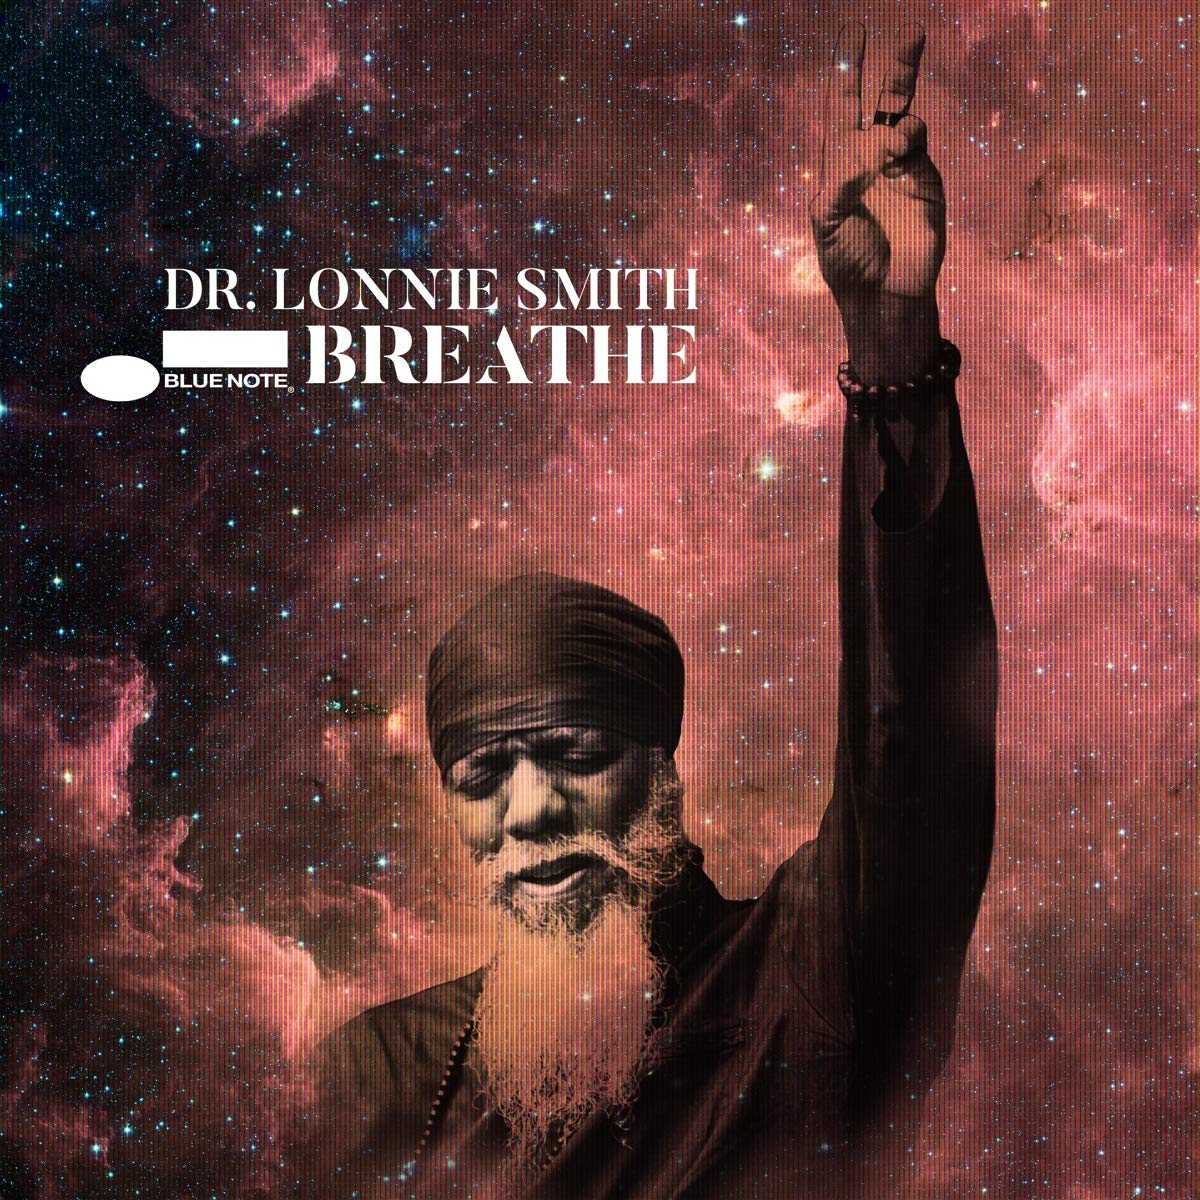 Dr. Lonnie Smith: Breathe